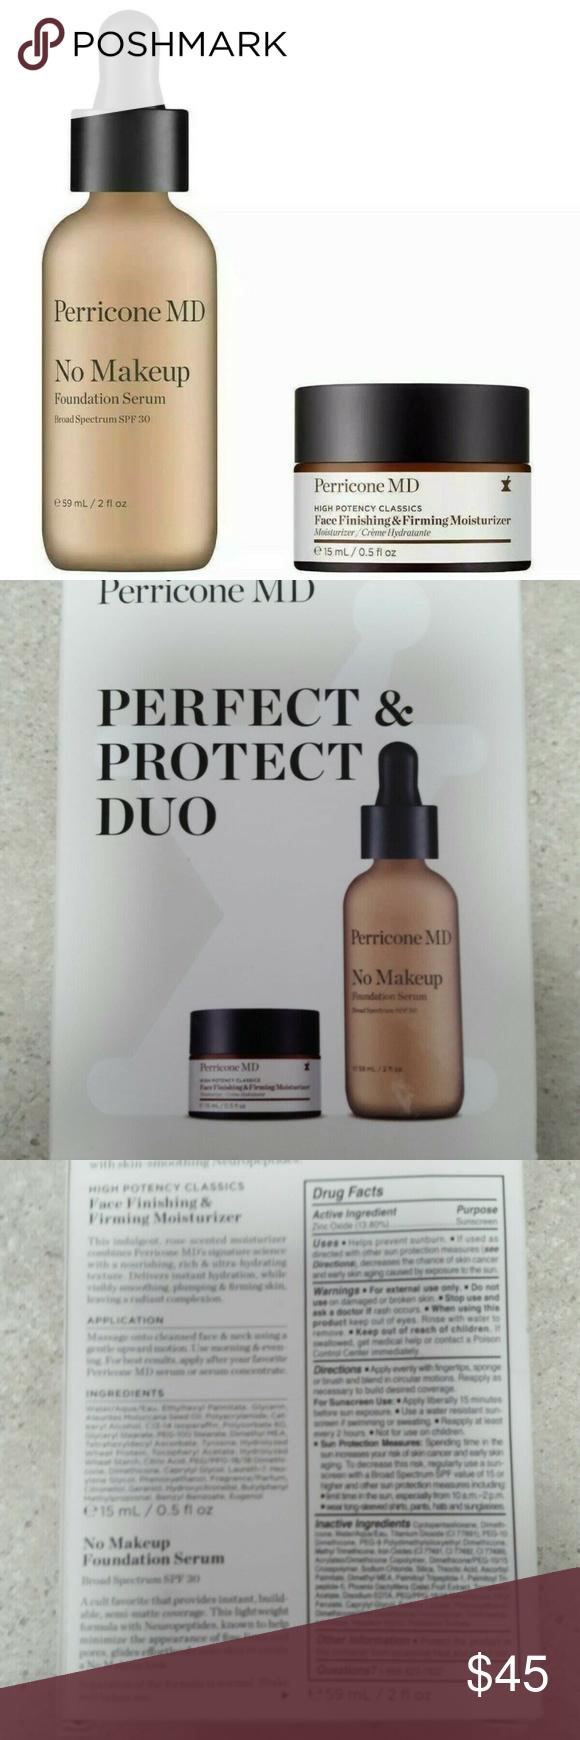 Perricone MD No Makeup Foundation Serum Golden Makeup